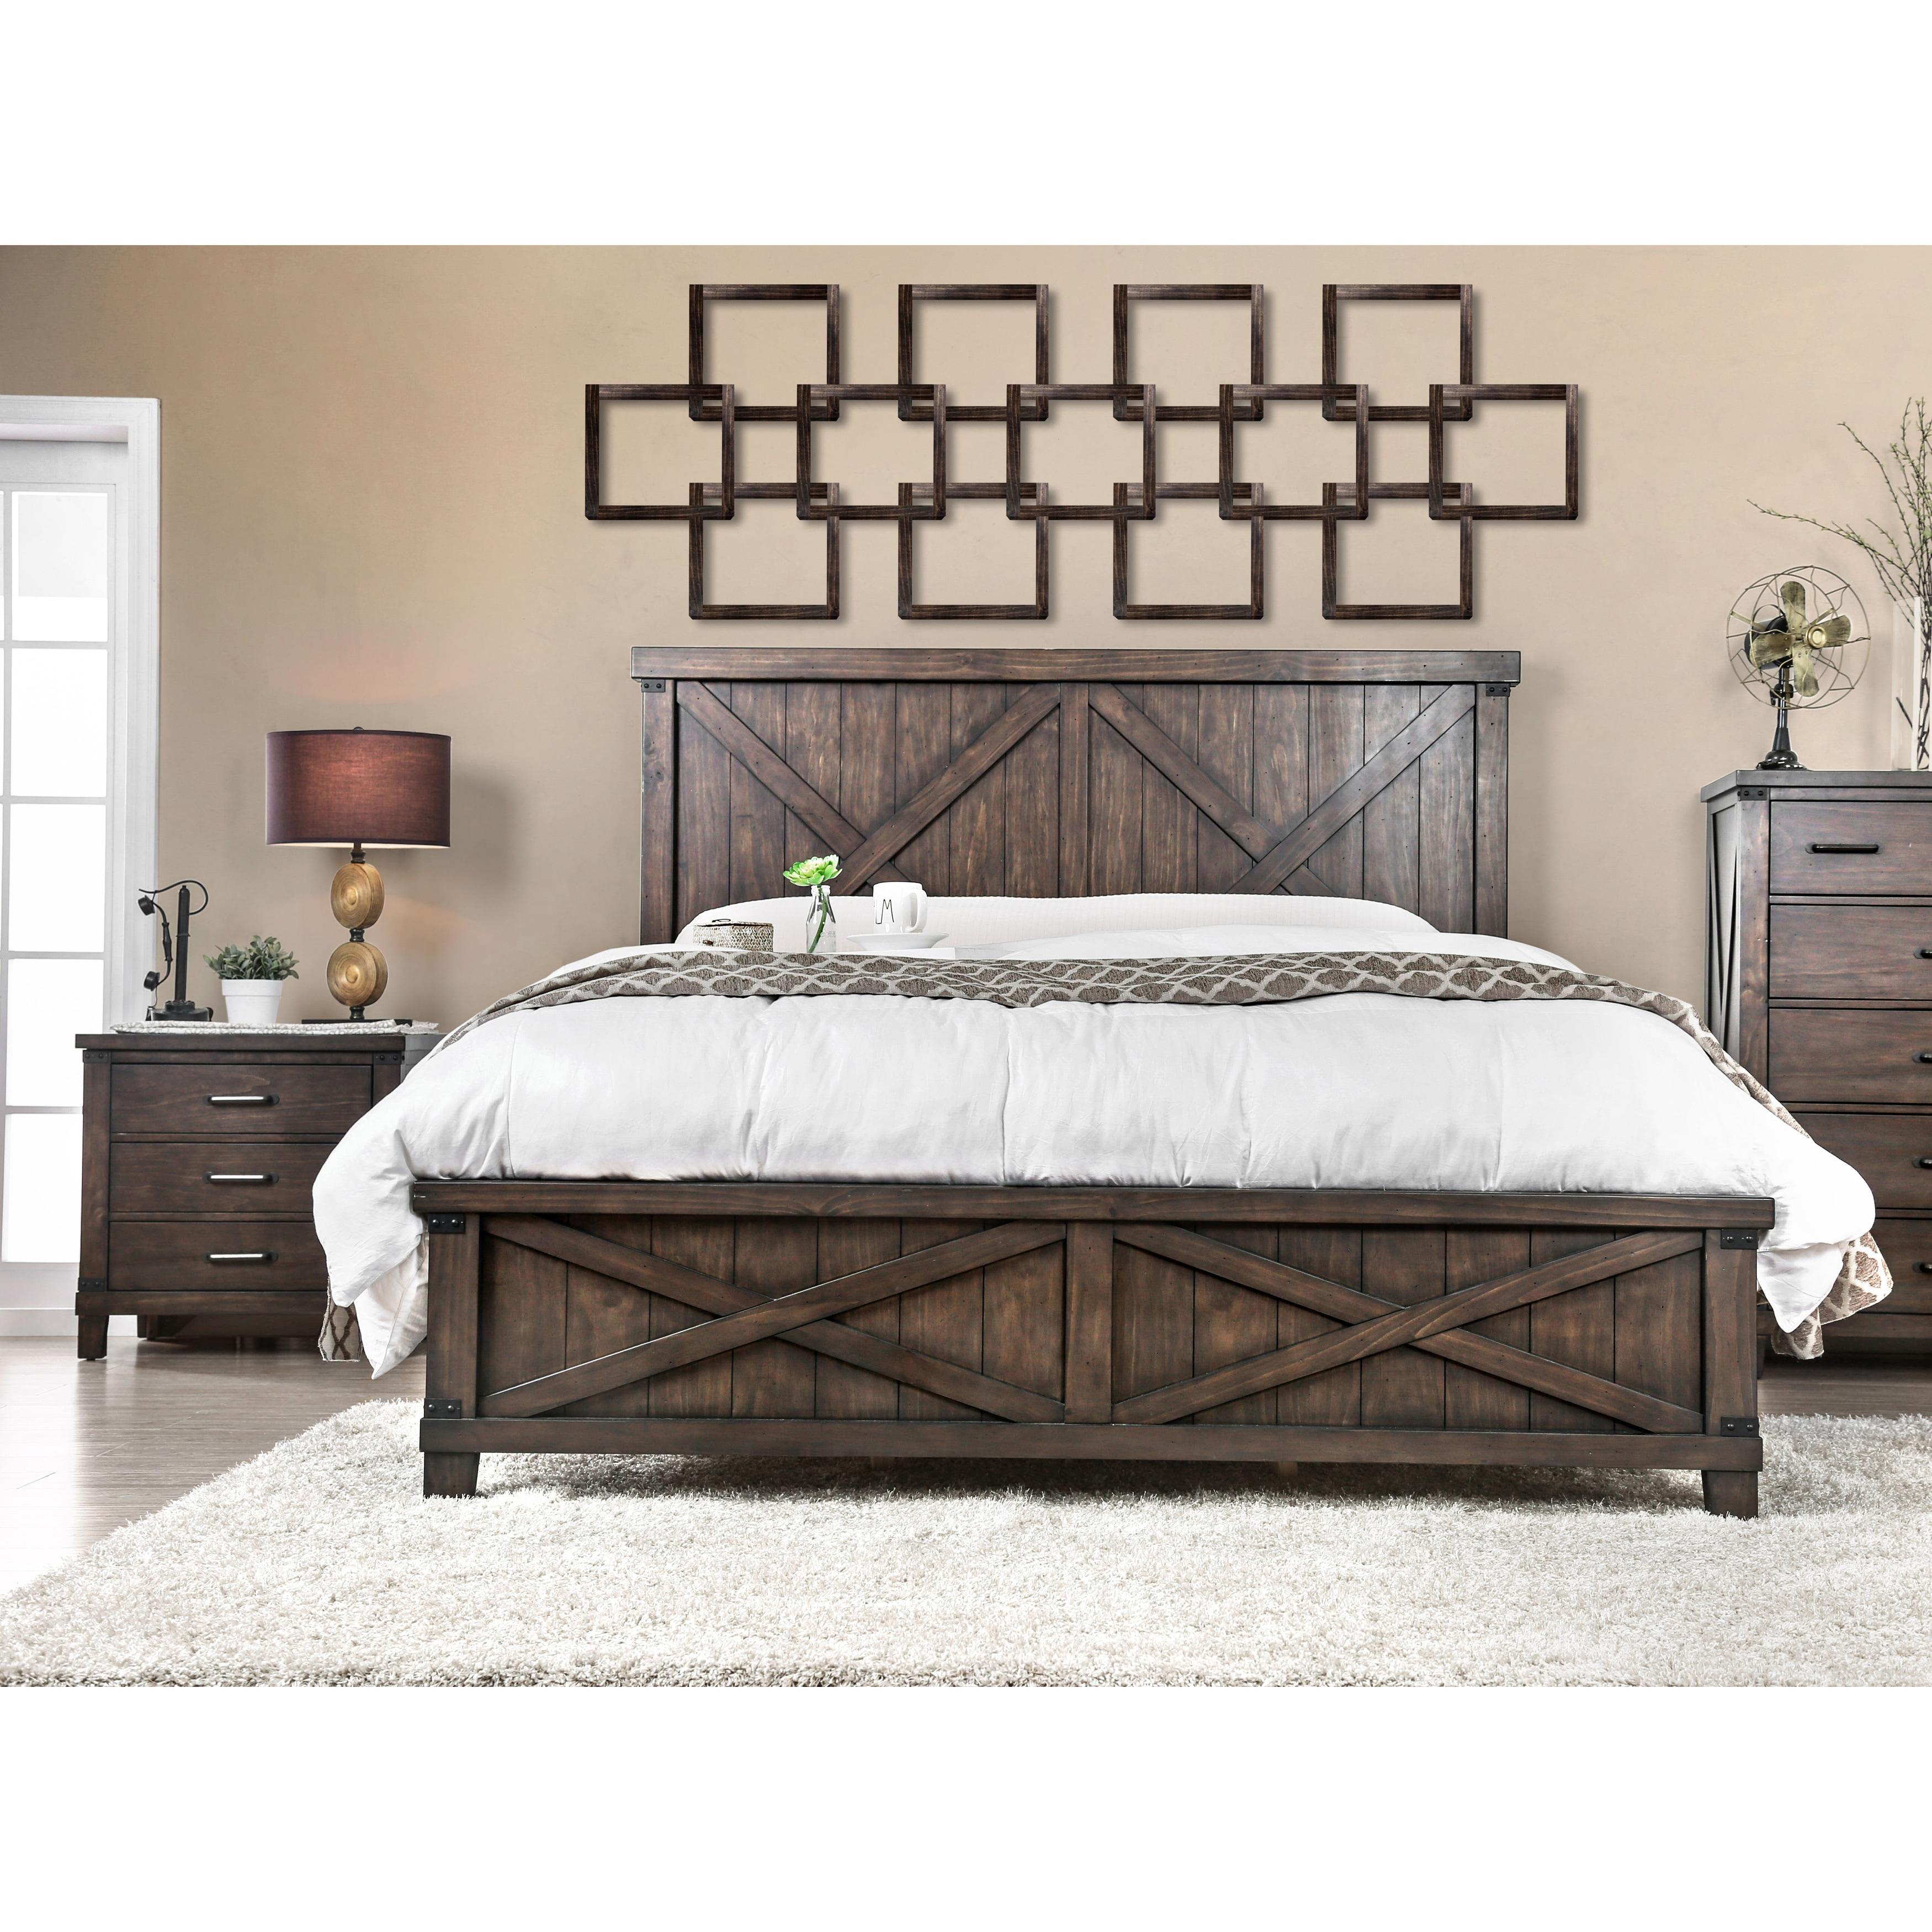 The Gray Barn Epona Rustic 2-piece Dark Walnut Bed and Nightstand Set